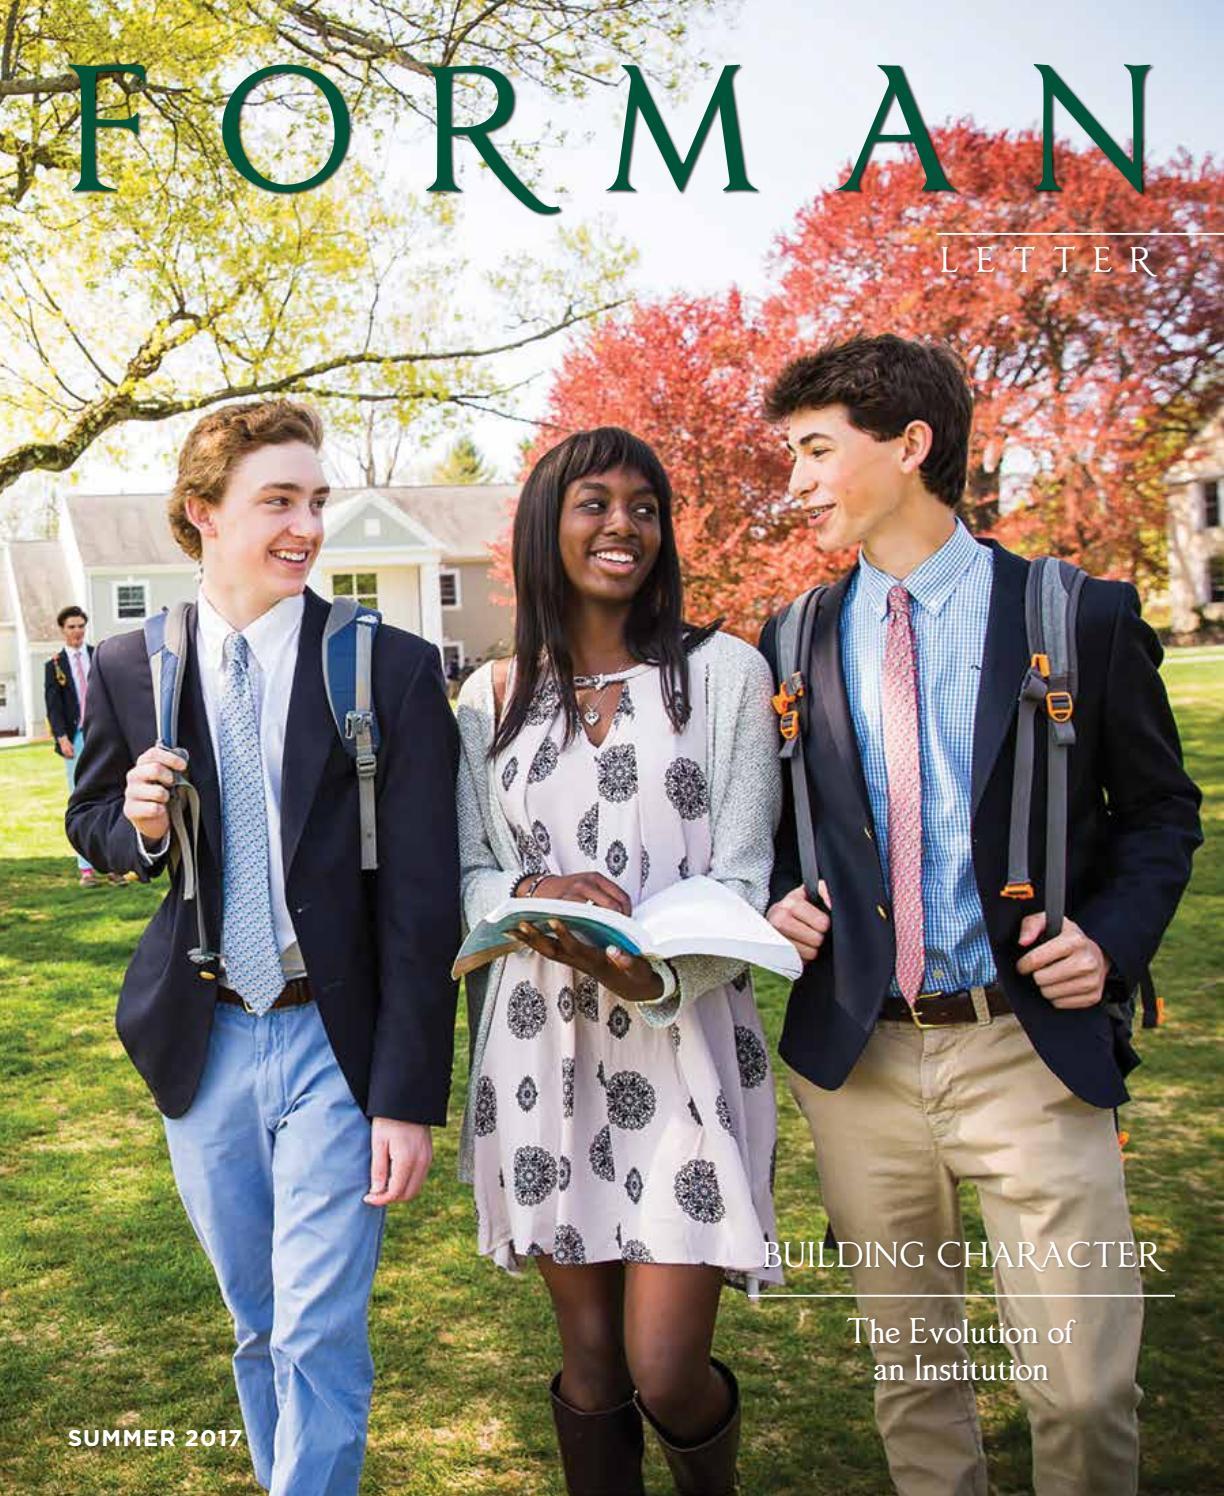 Forman Letter Summer 2017 by Forman School - issuu